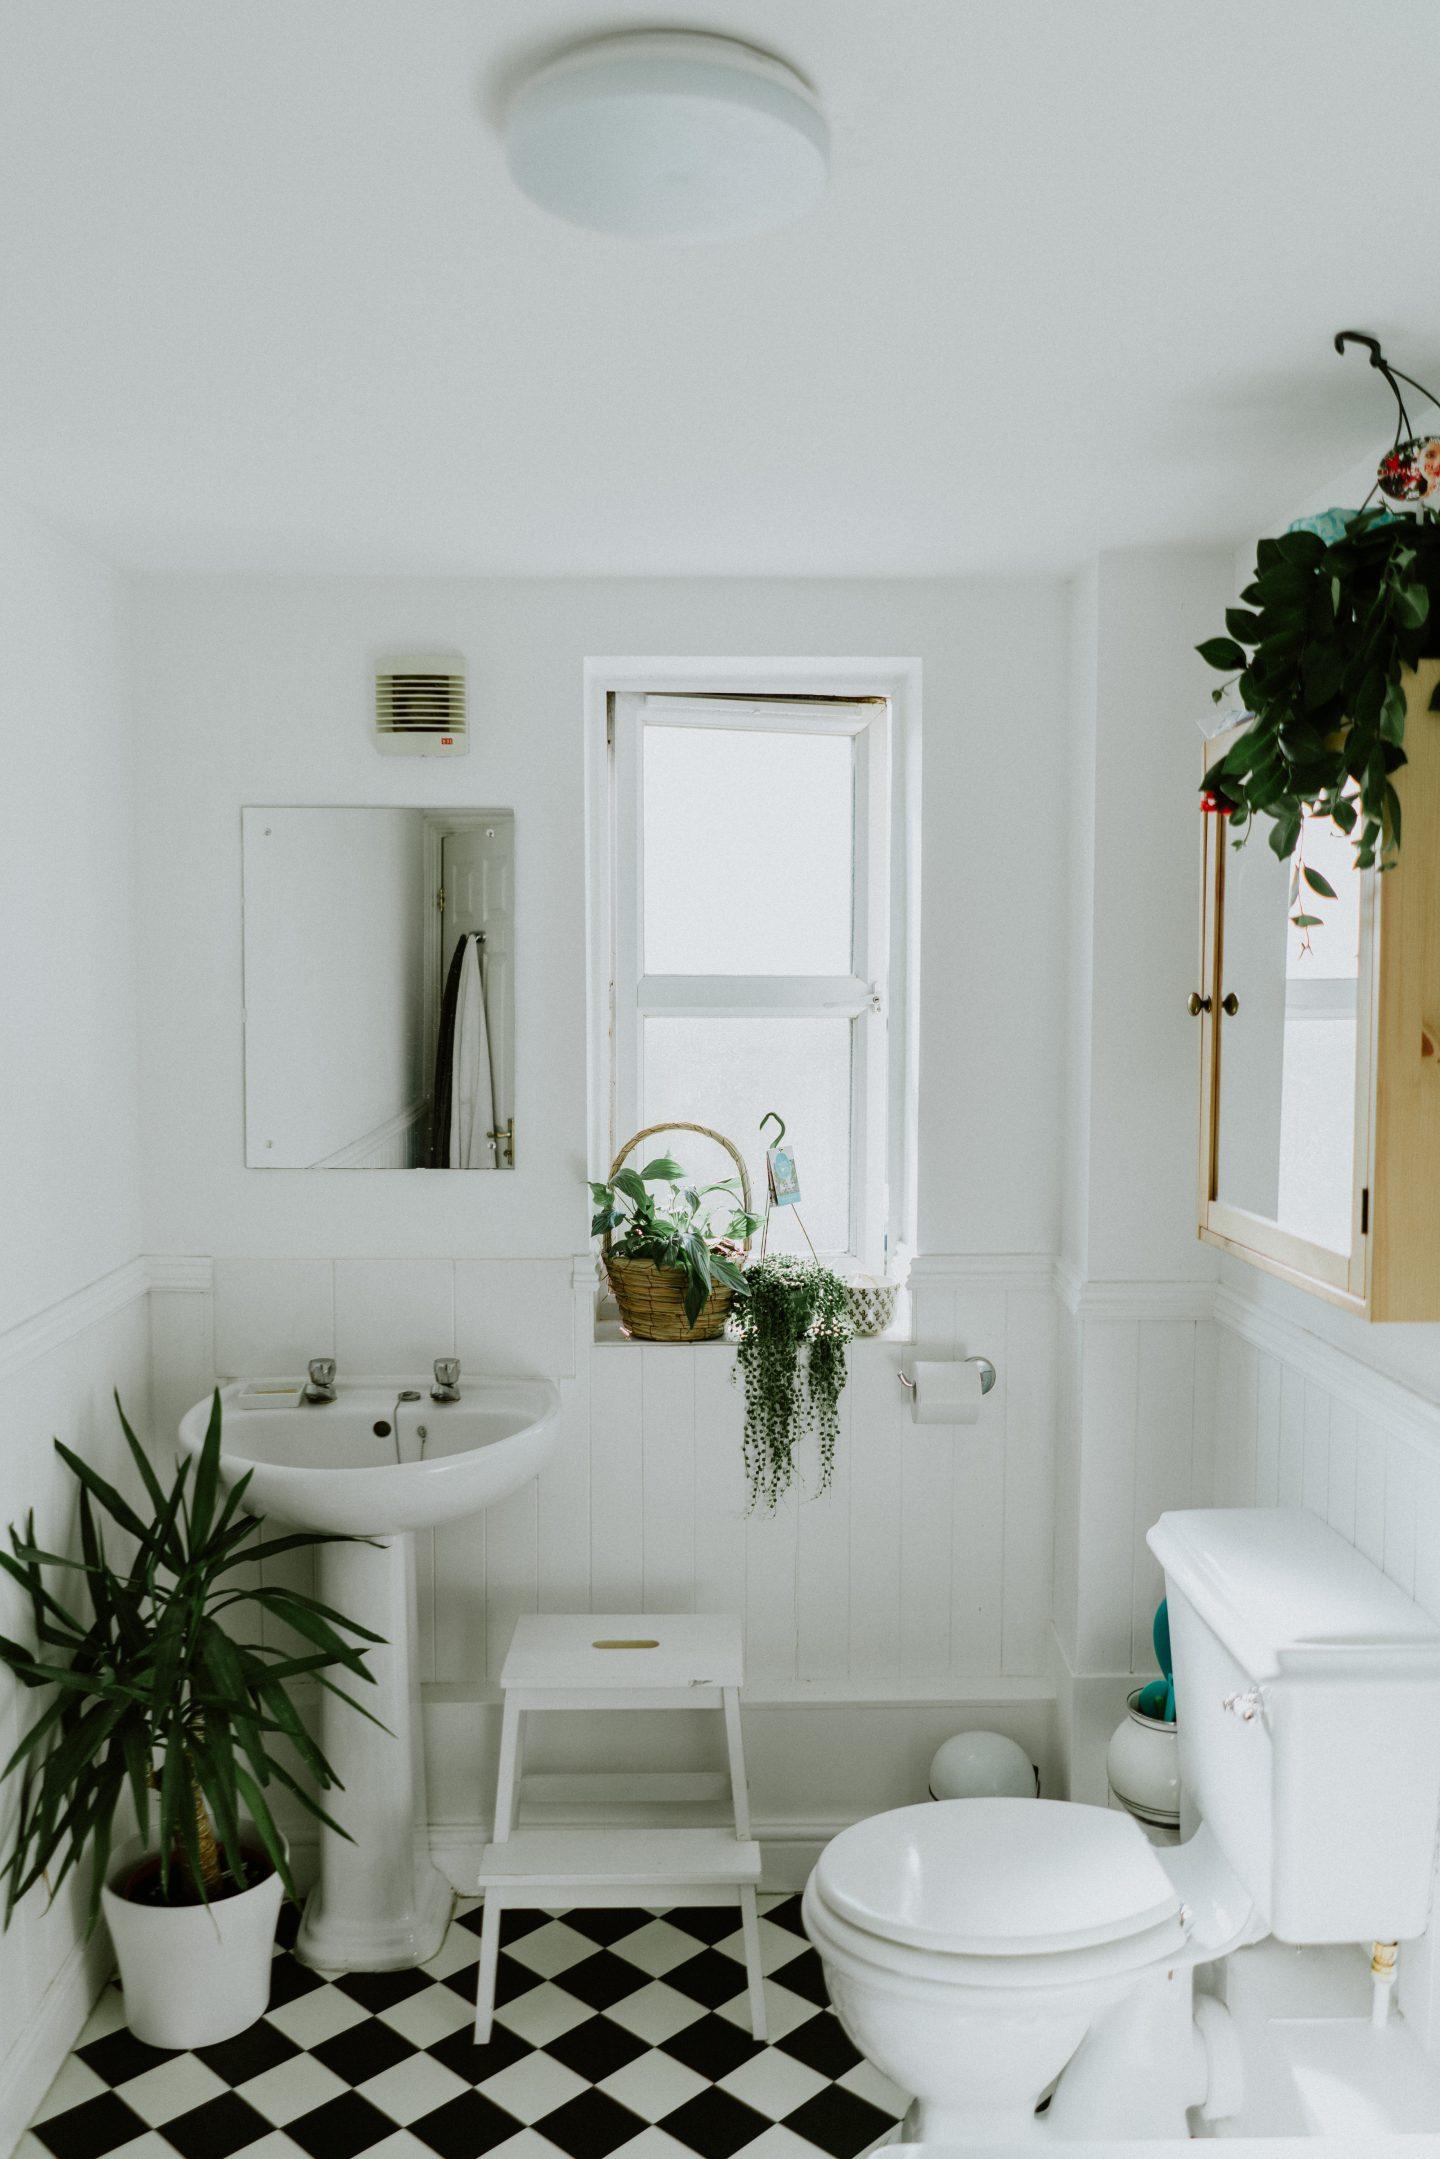 Zero waste series: Your guide to a Zero waste bathroom